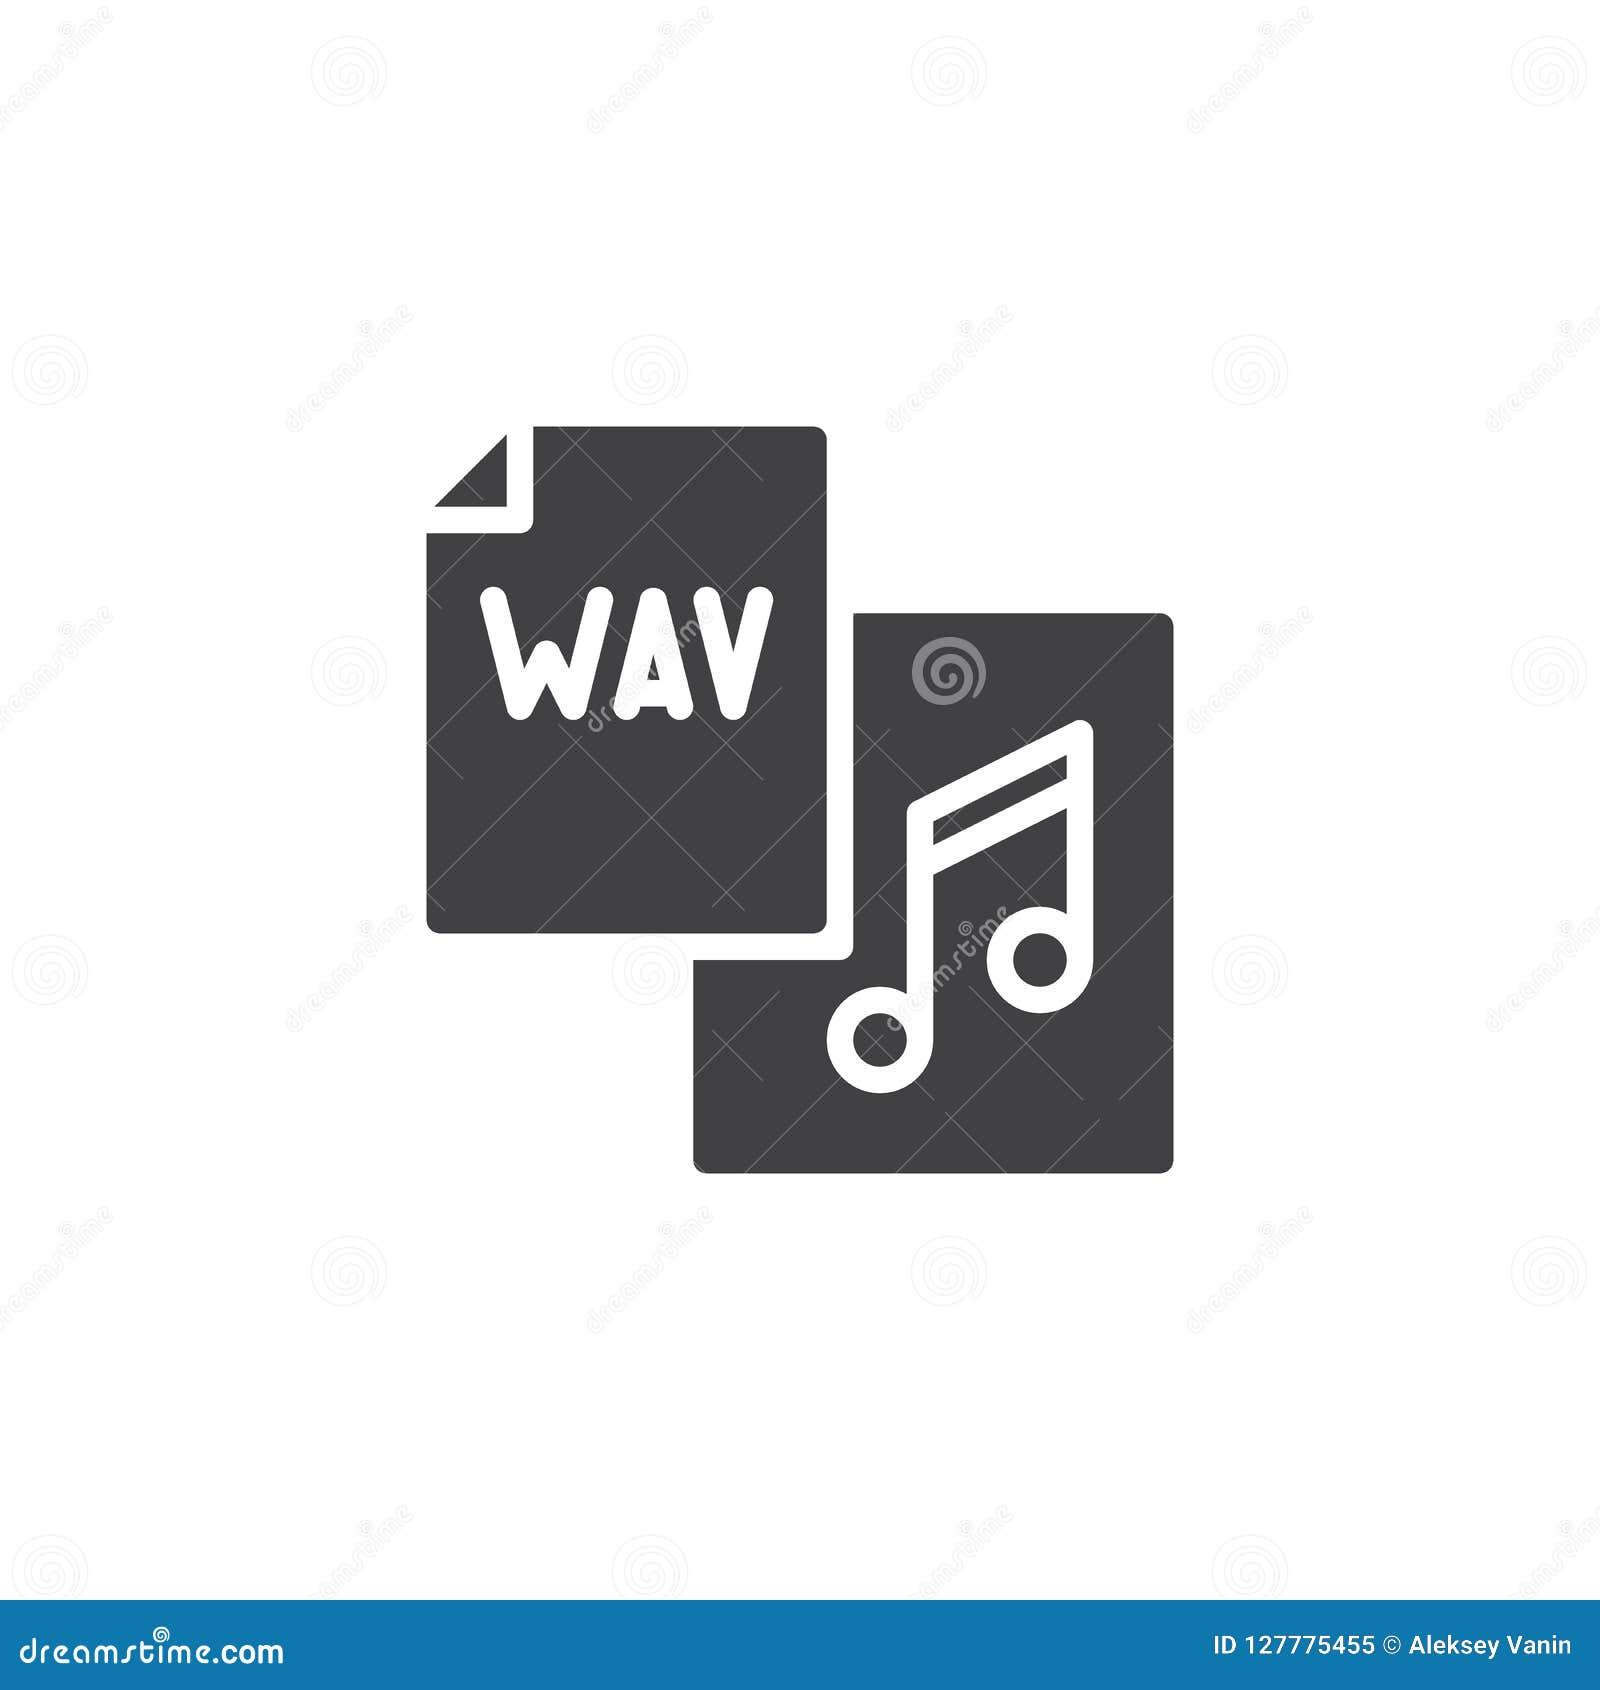 Wav File Format Vector Icon Stock Vector - Illustration of paper